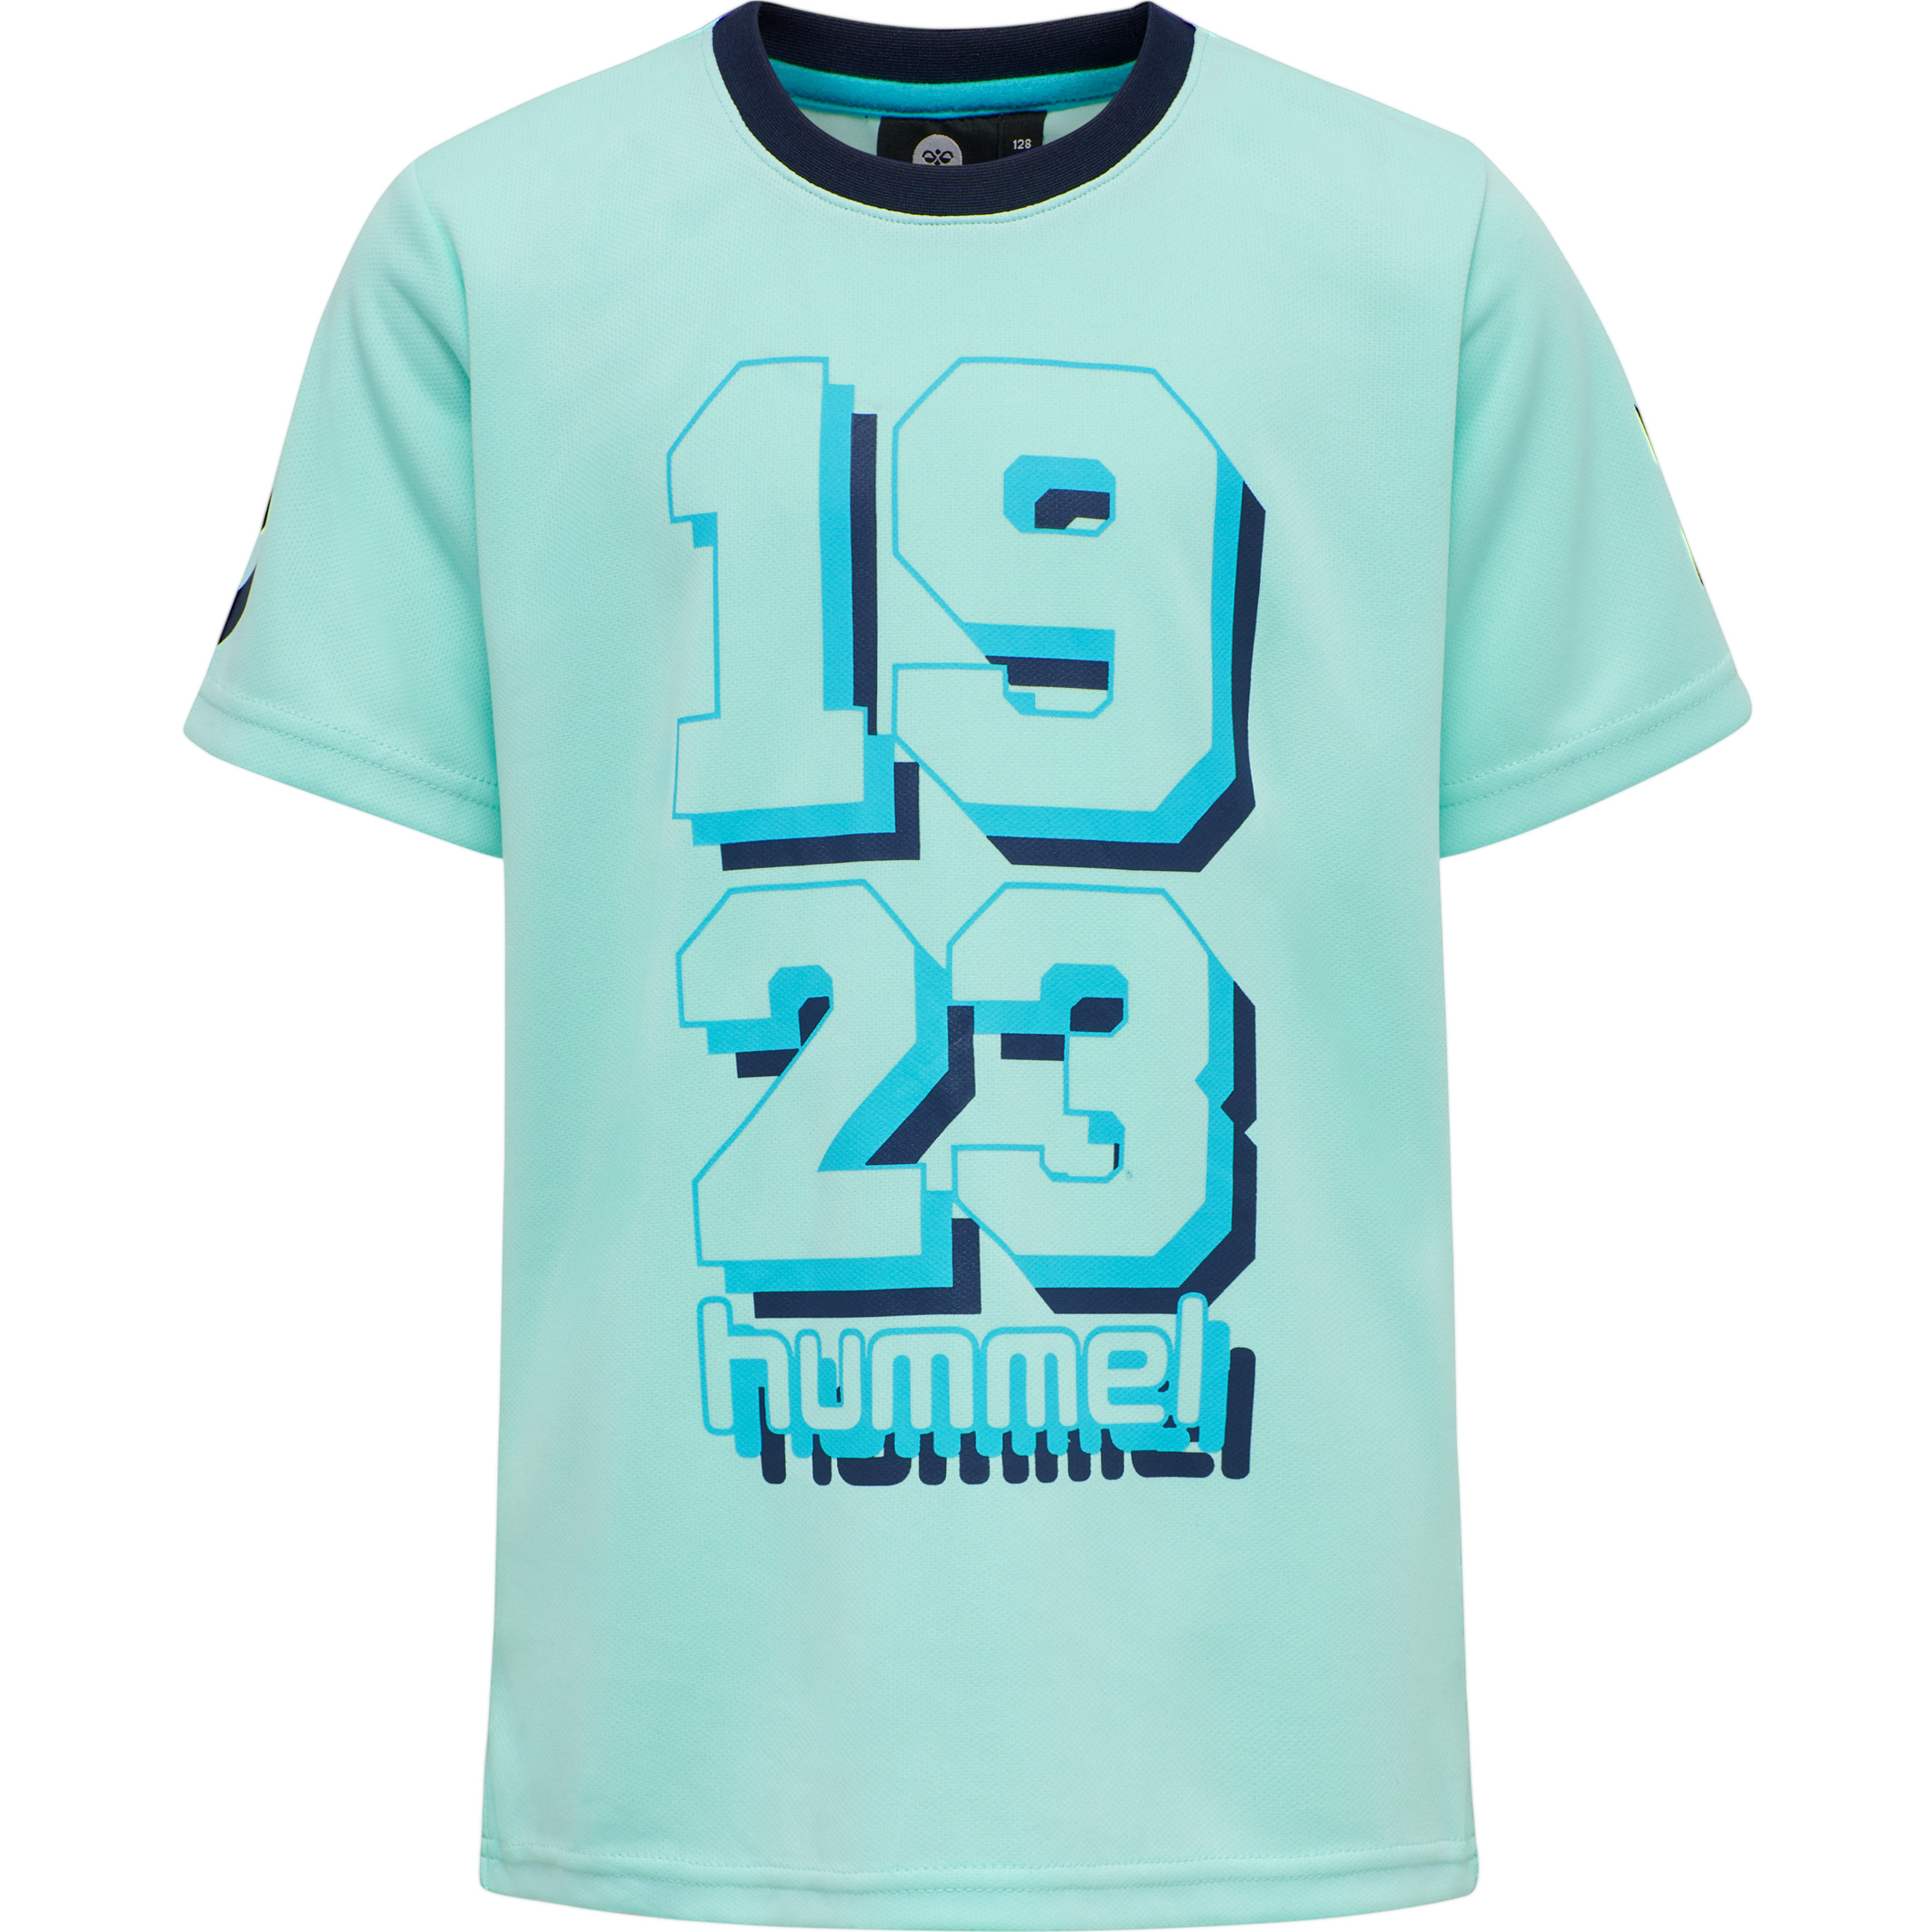 Hummel Shadow t-shirt, blue tint, 152